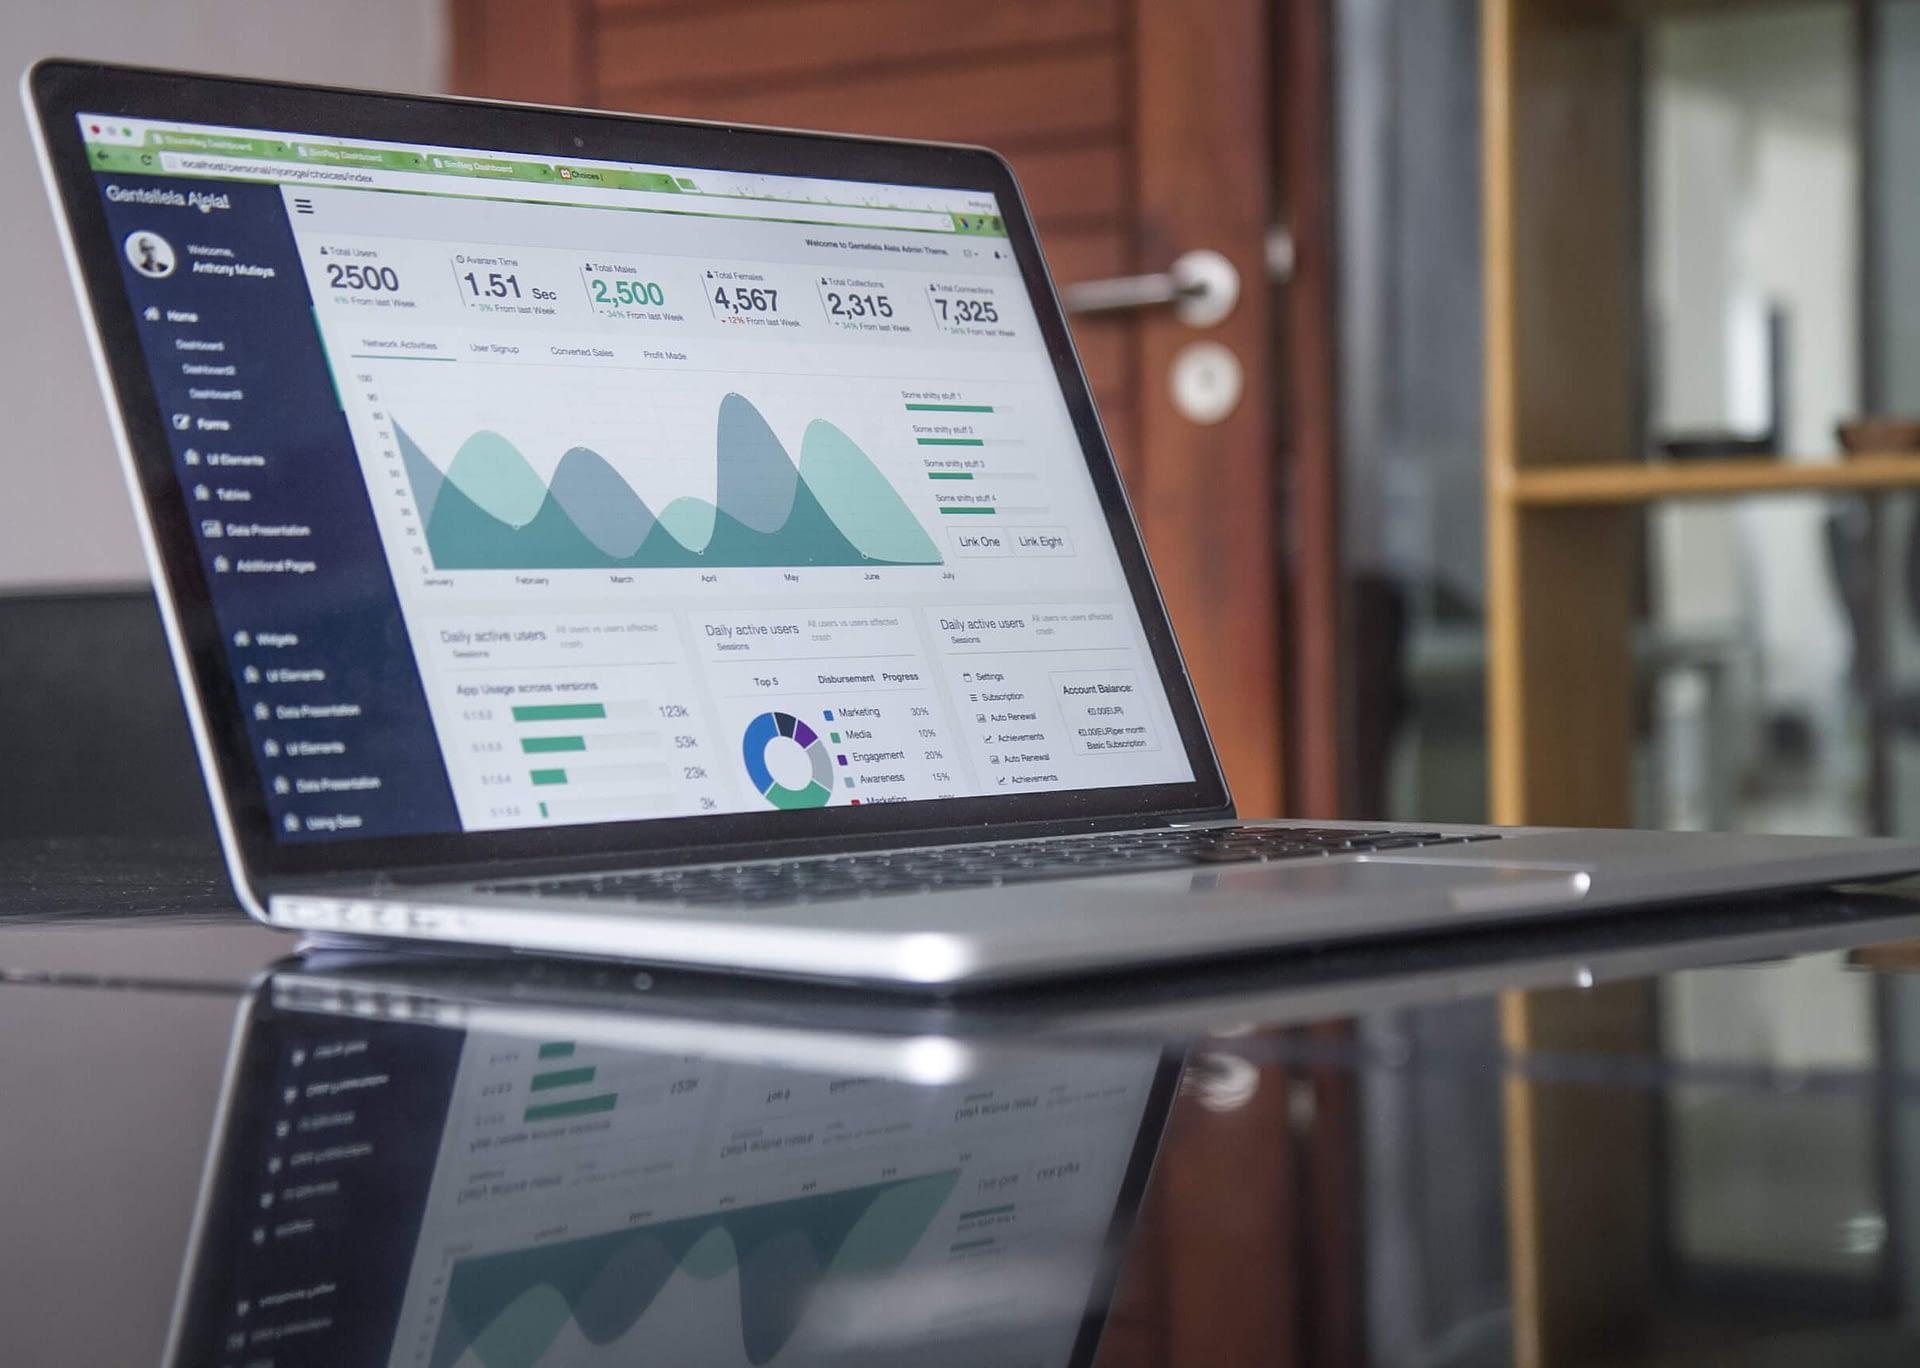 laptop-desk-technology-corporate-business-statistic-45505-pxhere.com